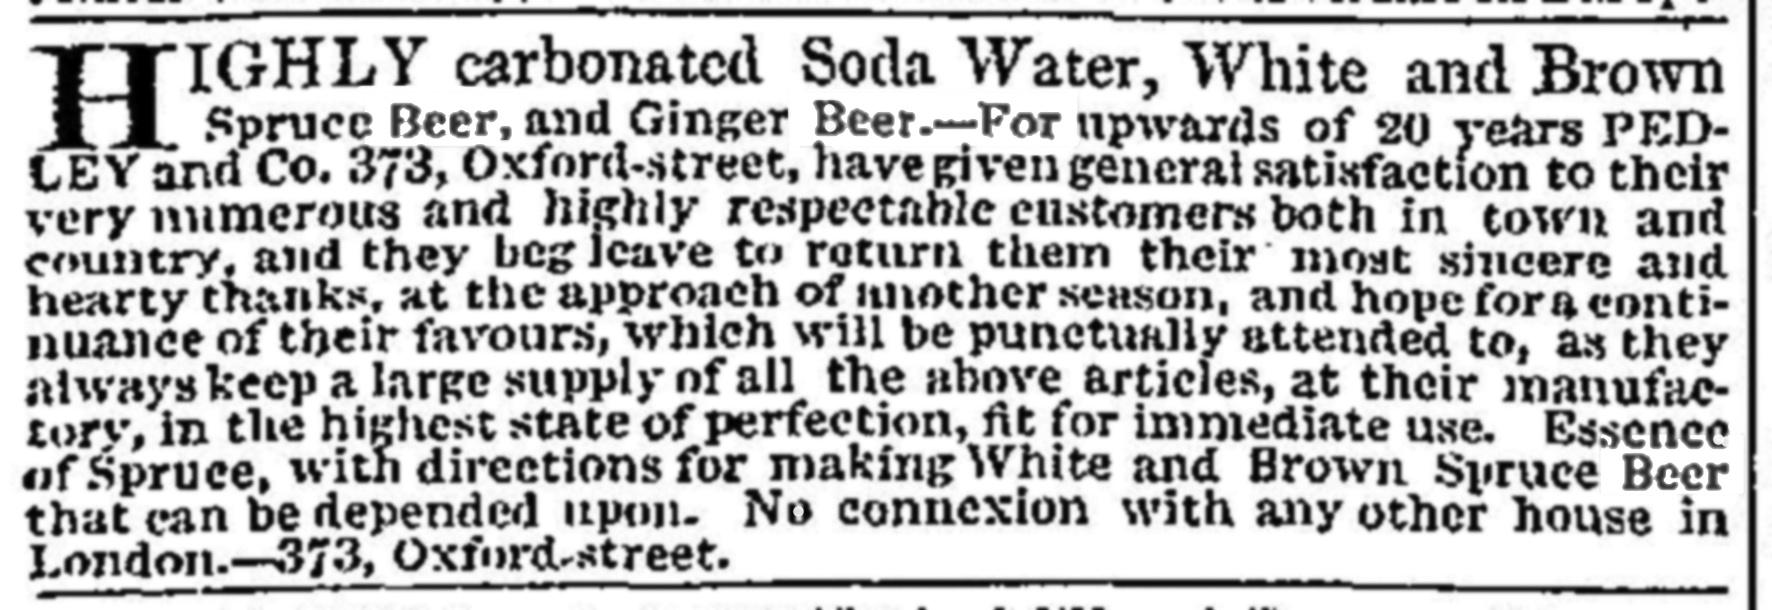 Pedley spruce beer 1819